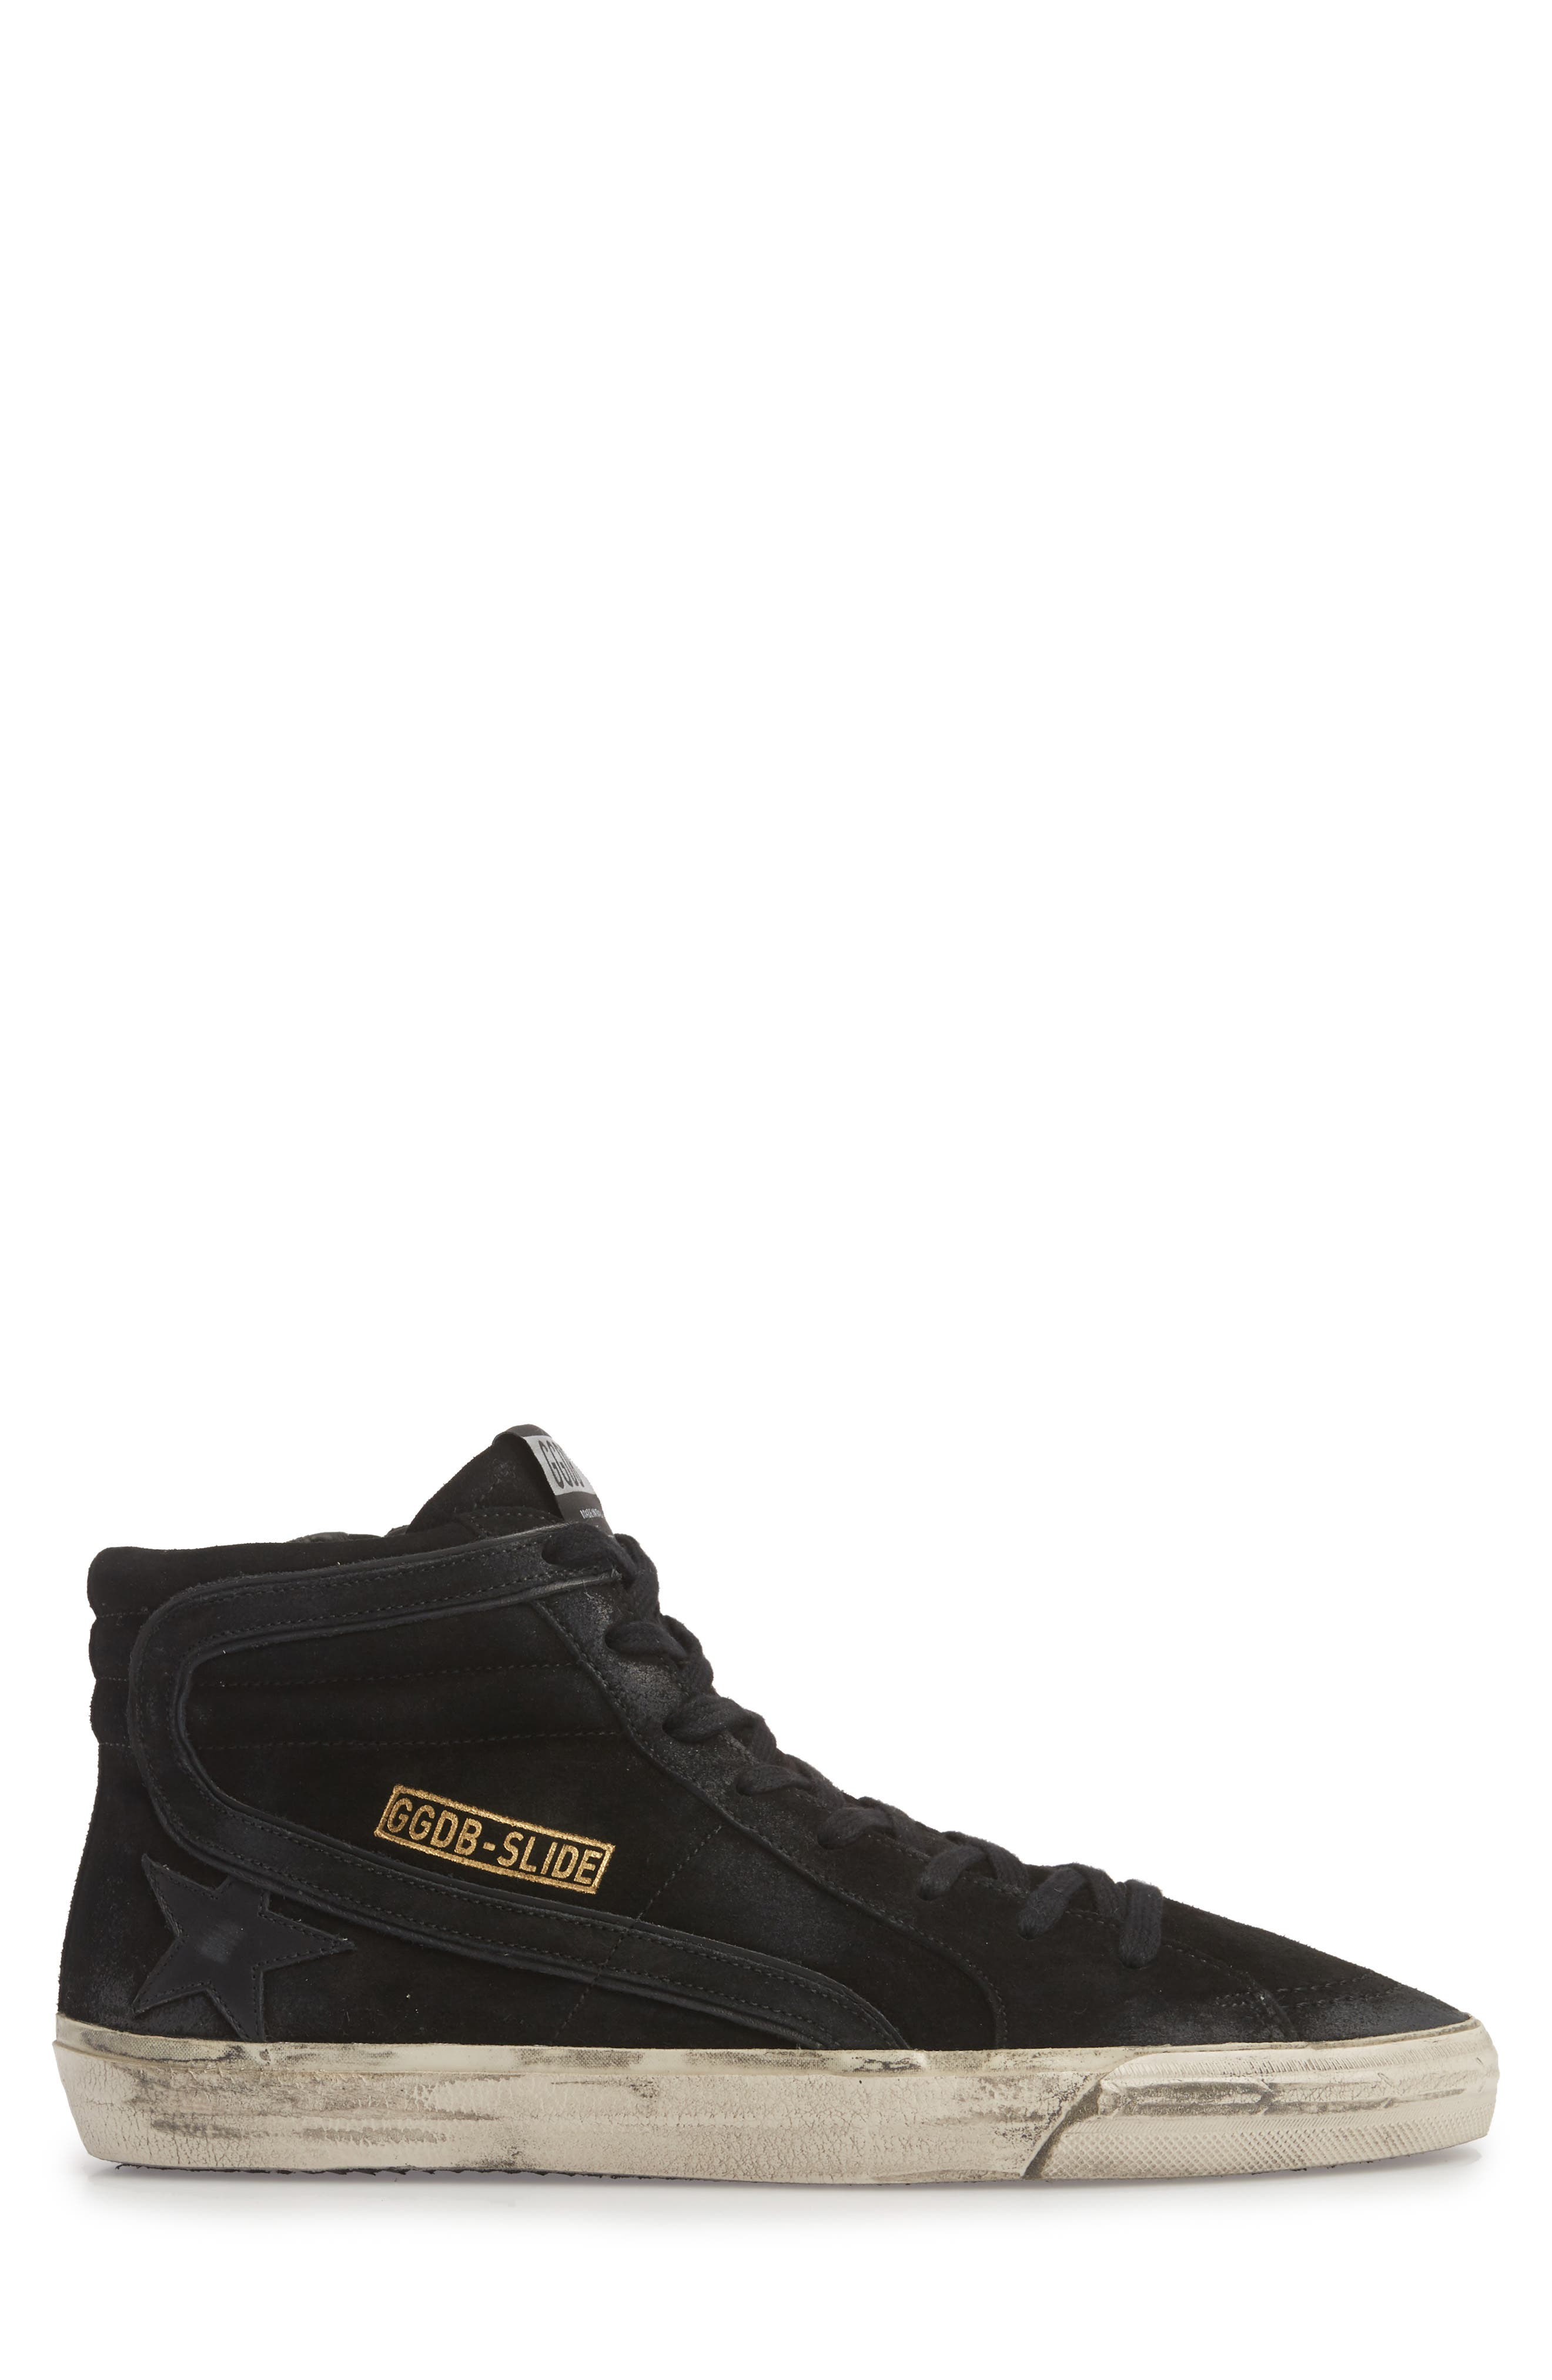 'Slide' Sneaker,                             Alternate thumbnail 3, color,                             BLACK SUEDE